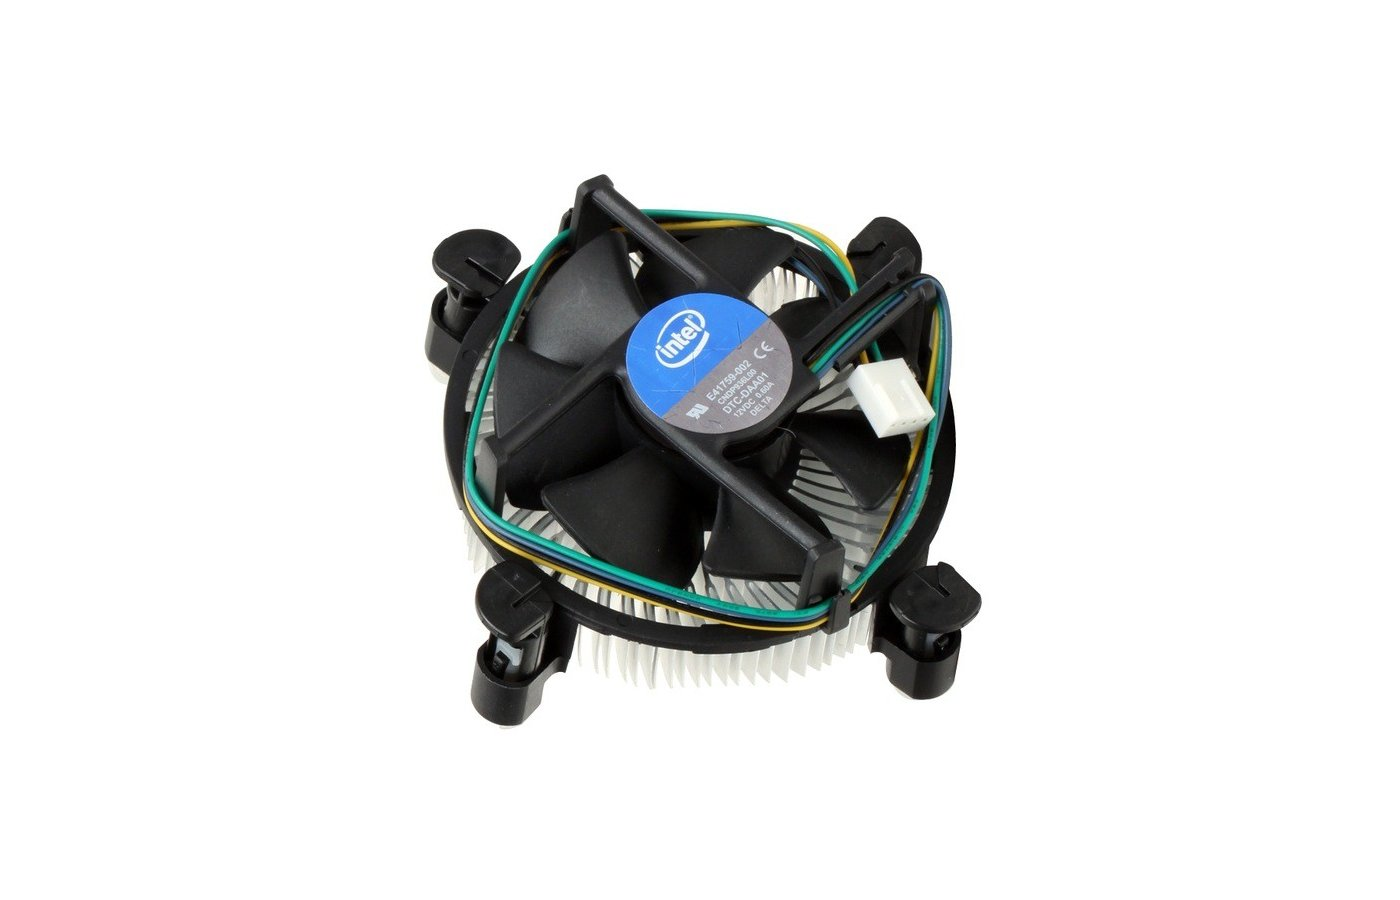 Охлаждение Intel Original Copper Base Soc-1150/1155/1156/ 4pin 18-38dB Al+Cu 105W 240g клипсы OEM